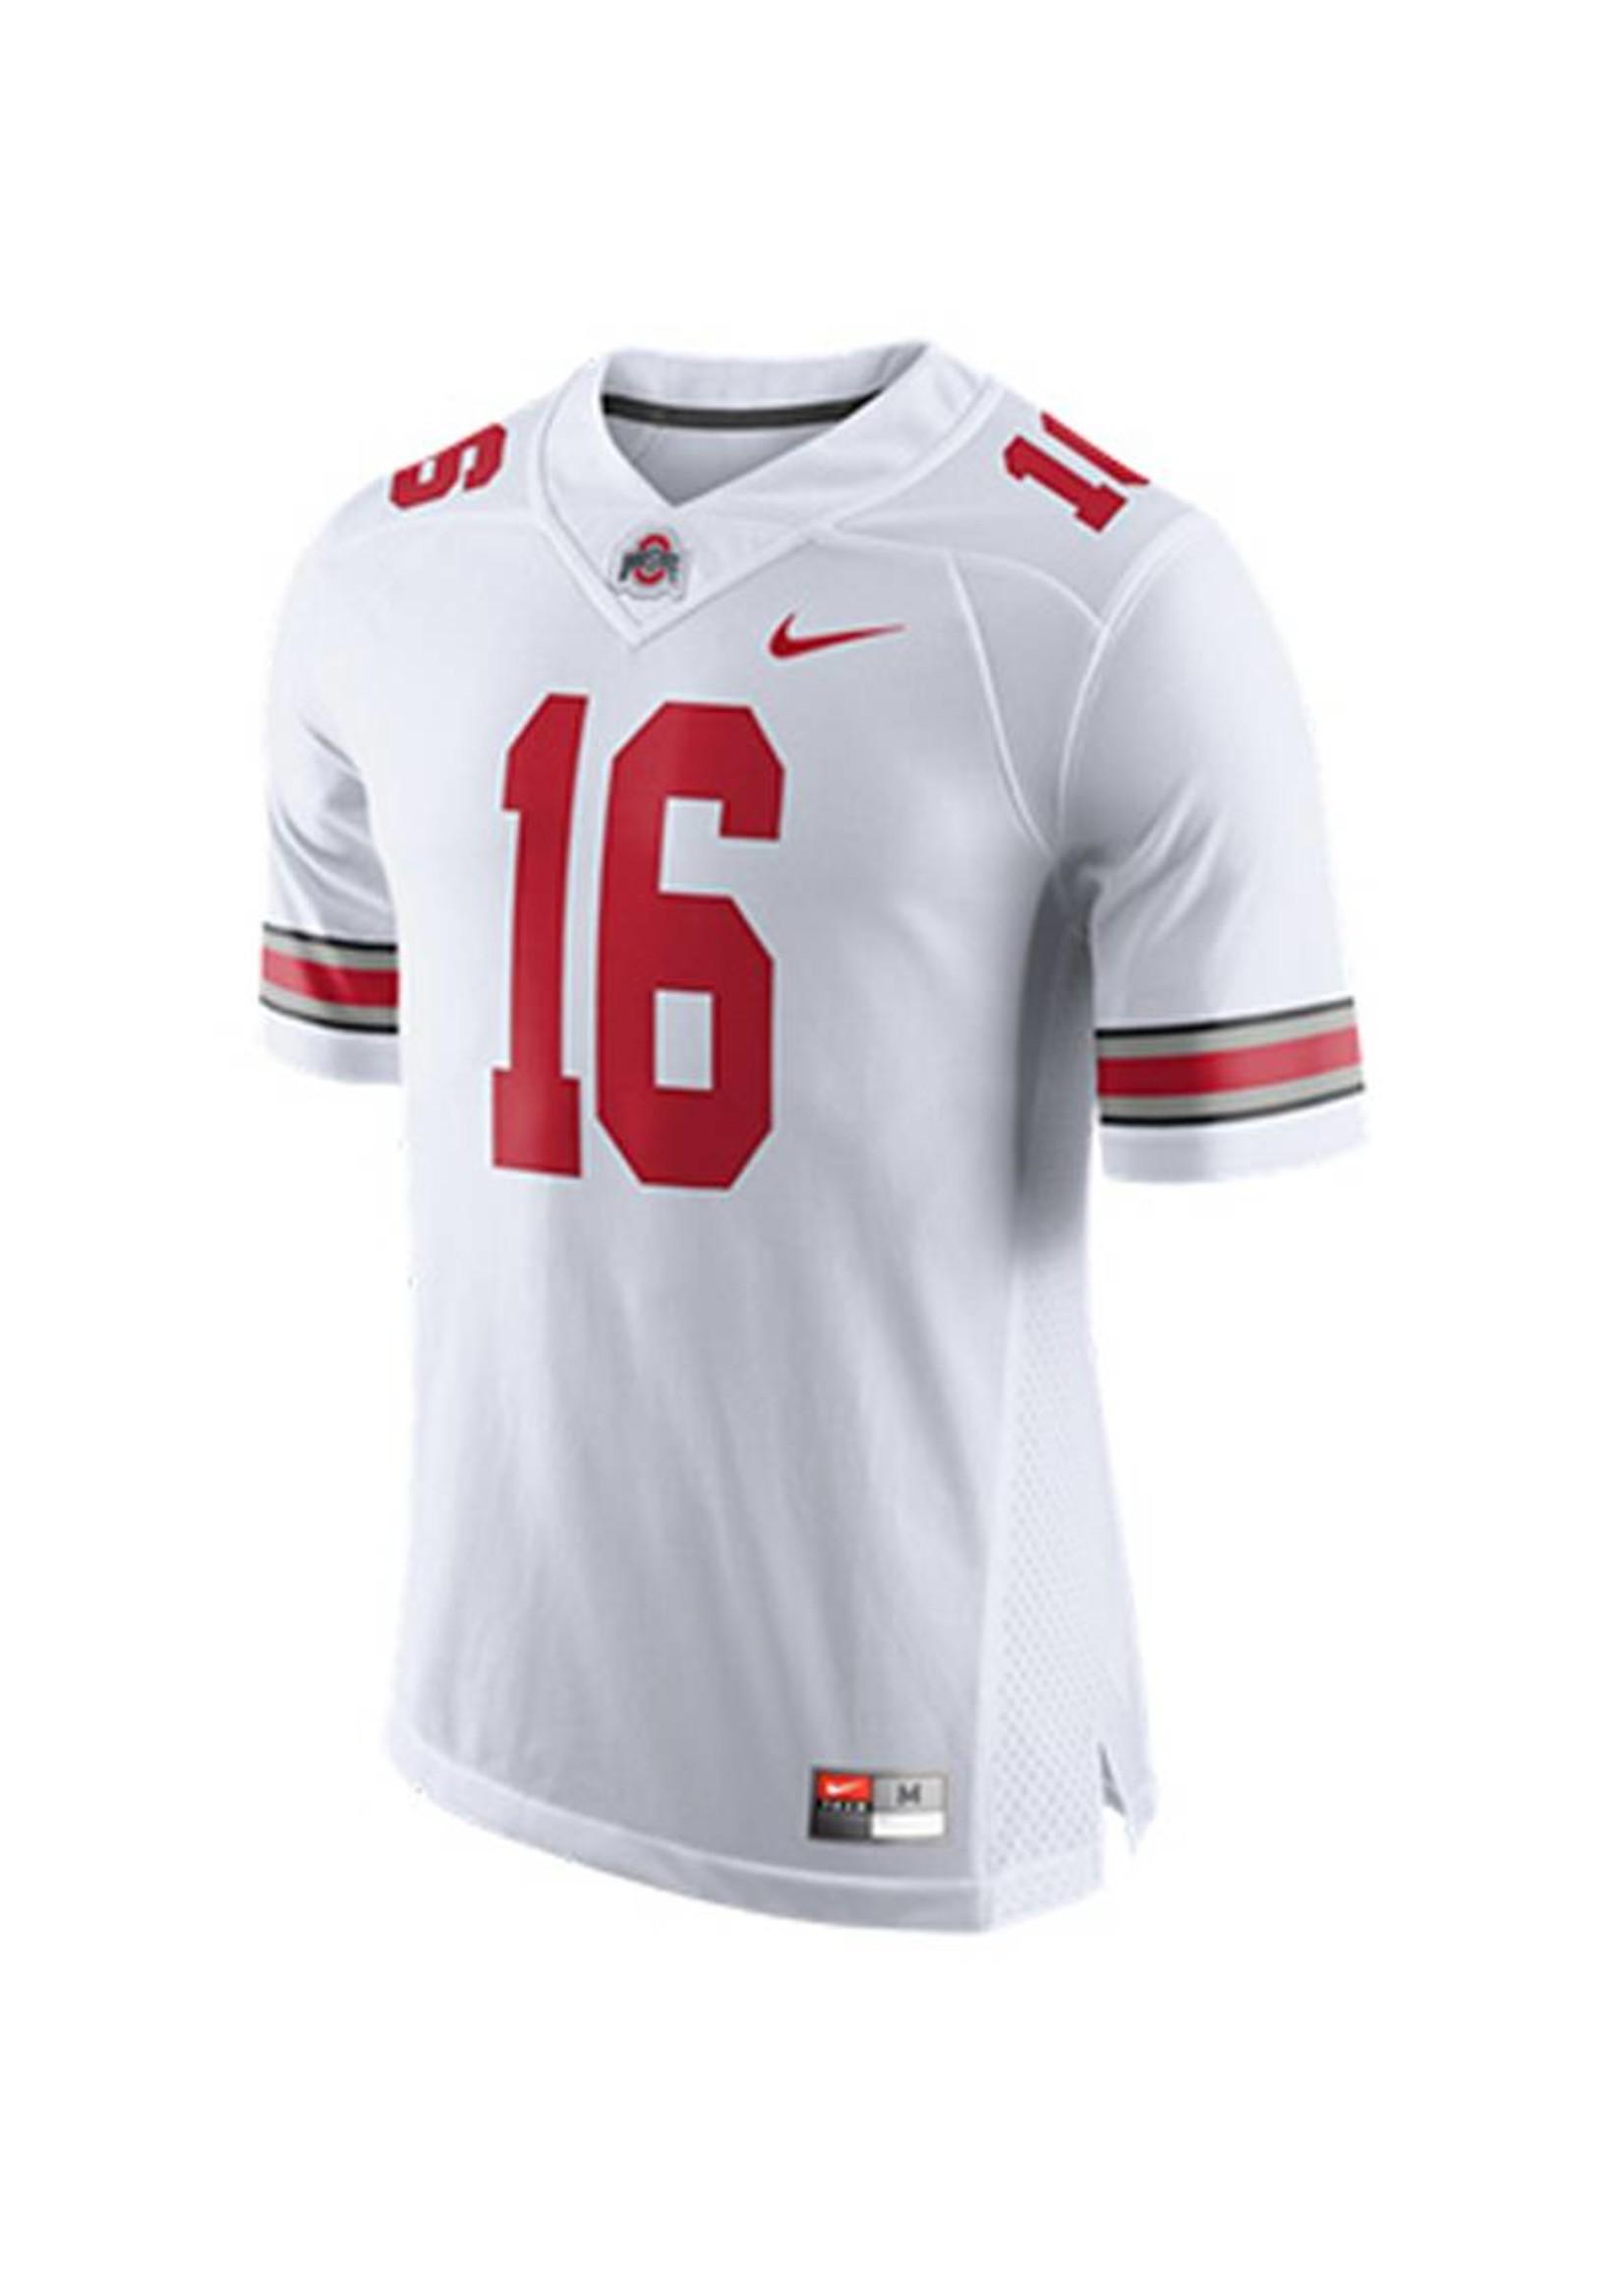 Nike Ohio State University Limited #16 Jersey